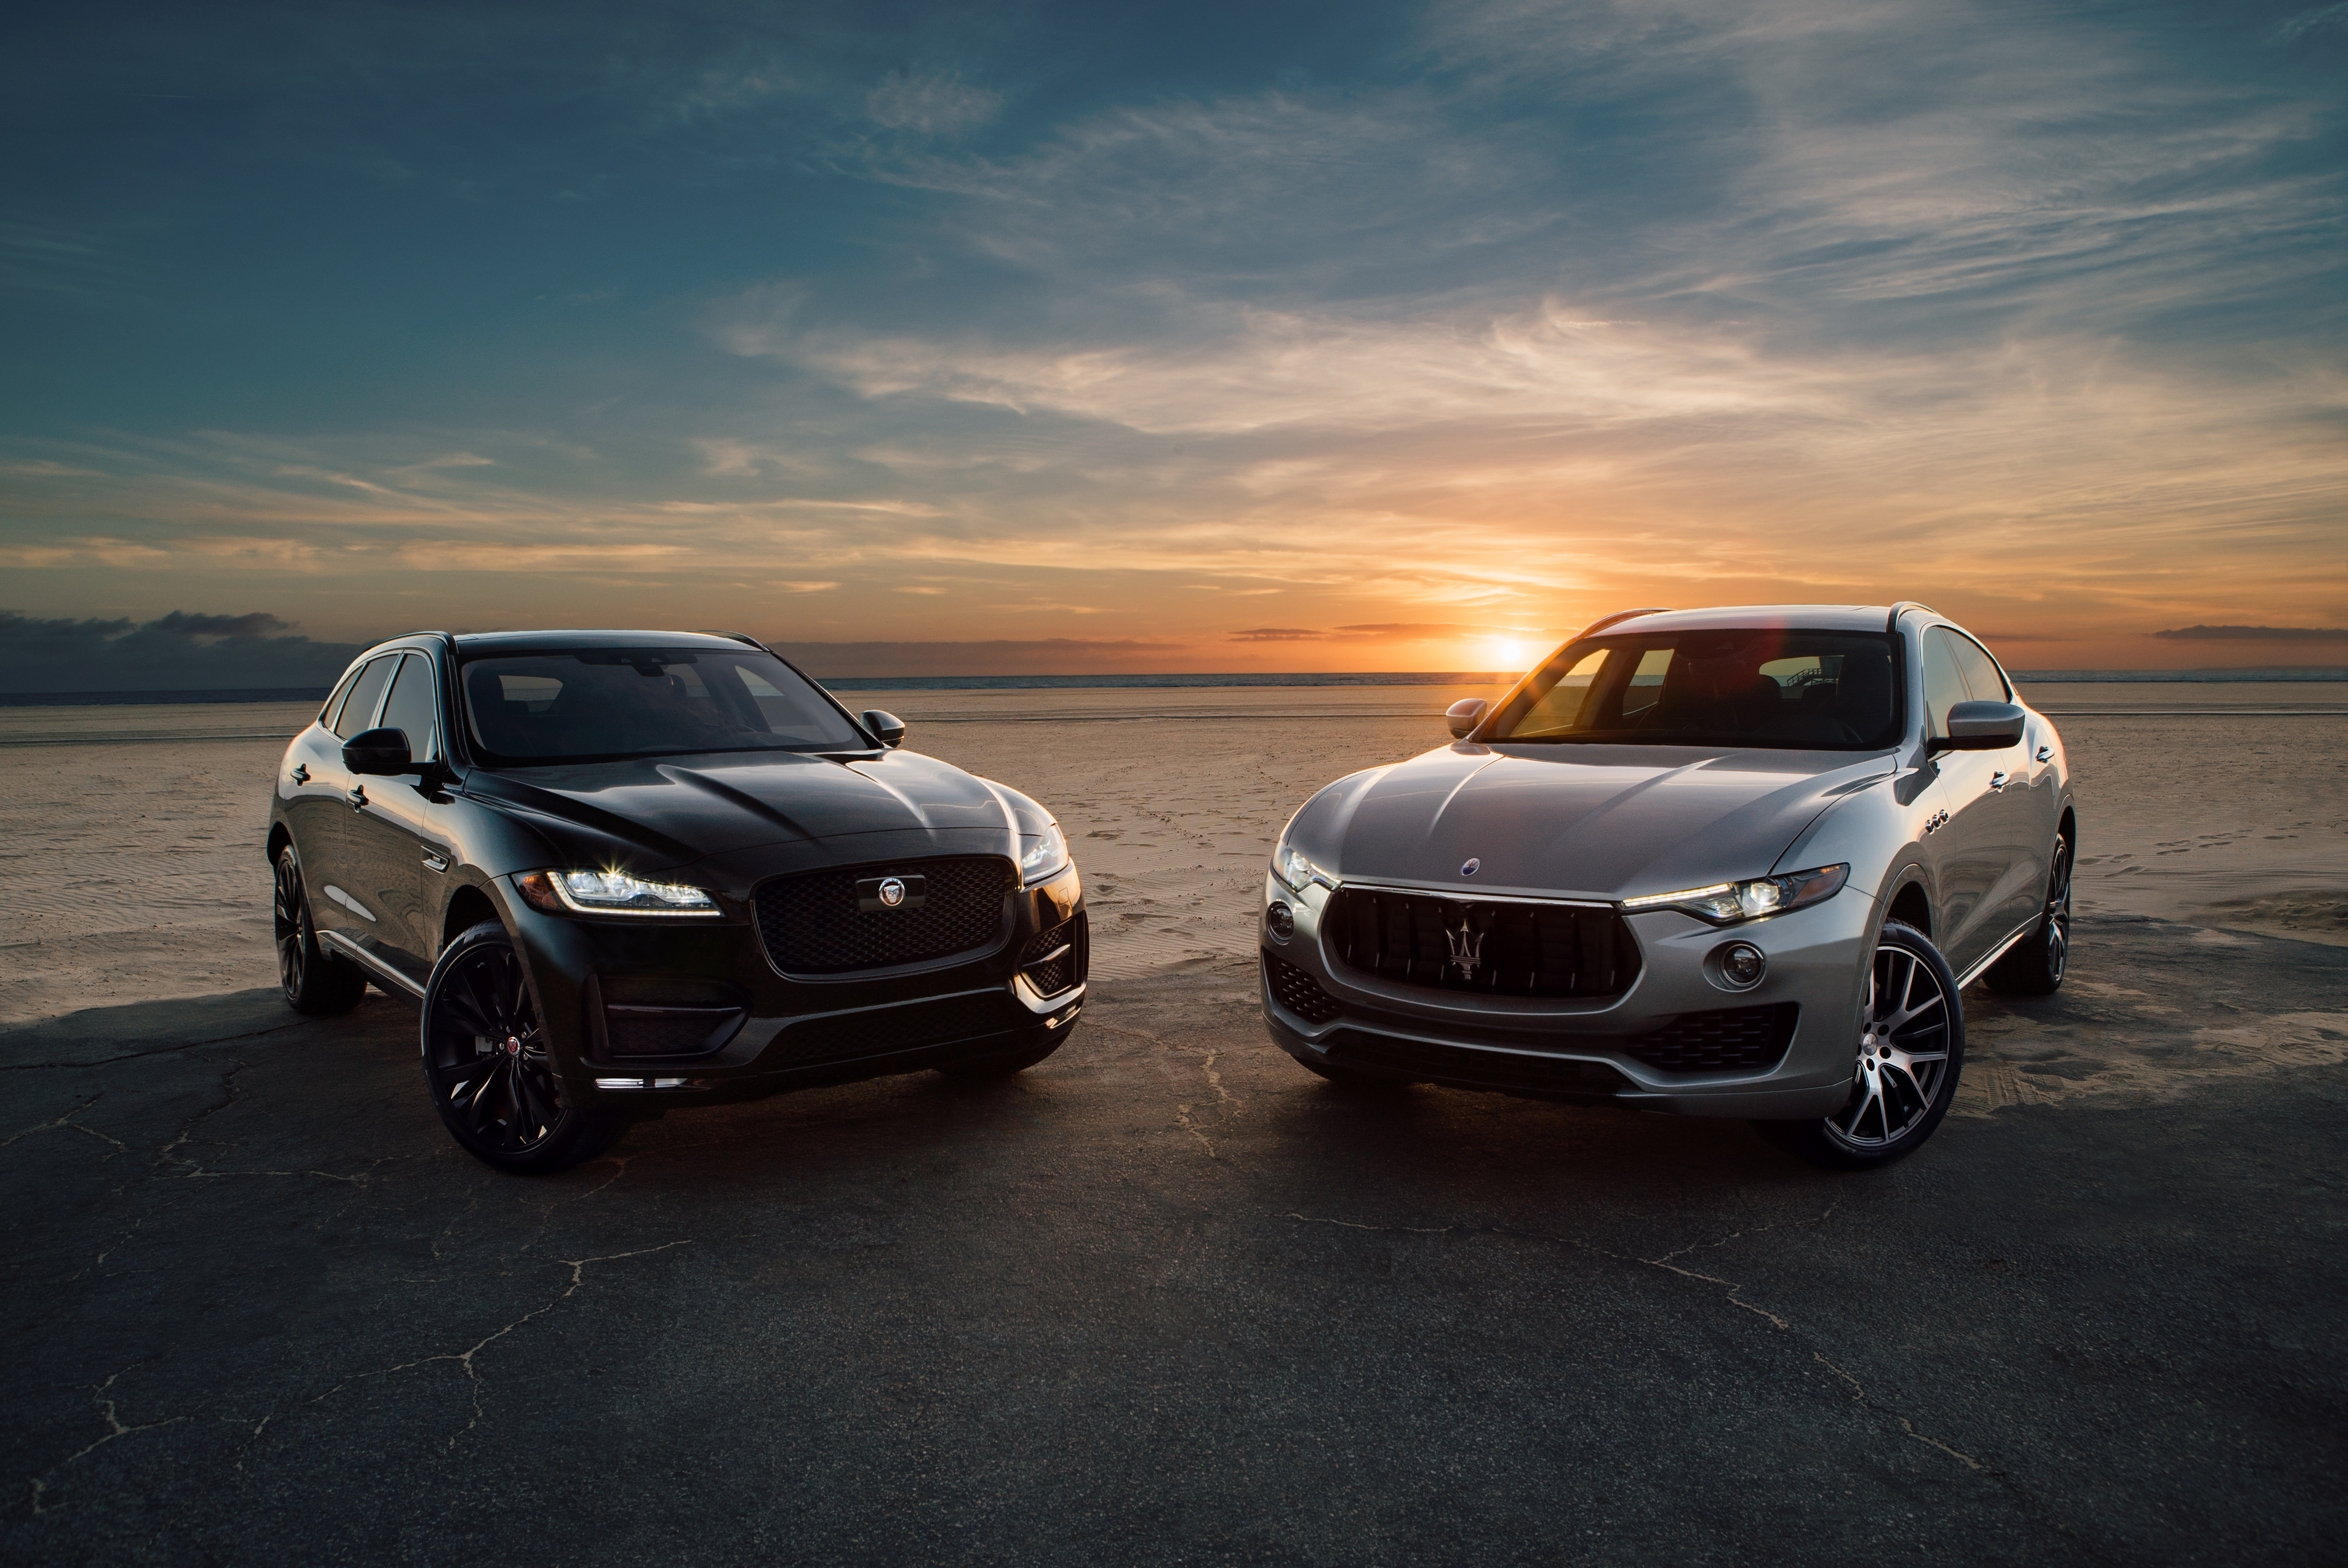 Jaguar F Pace R And Maserati Levante S Luxury Suv Test Drive Fortune